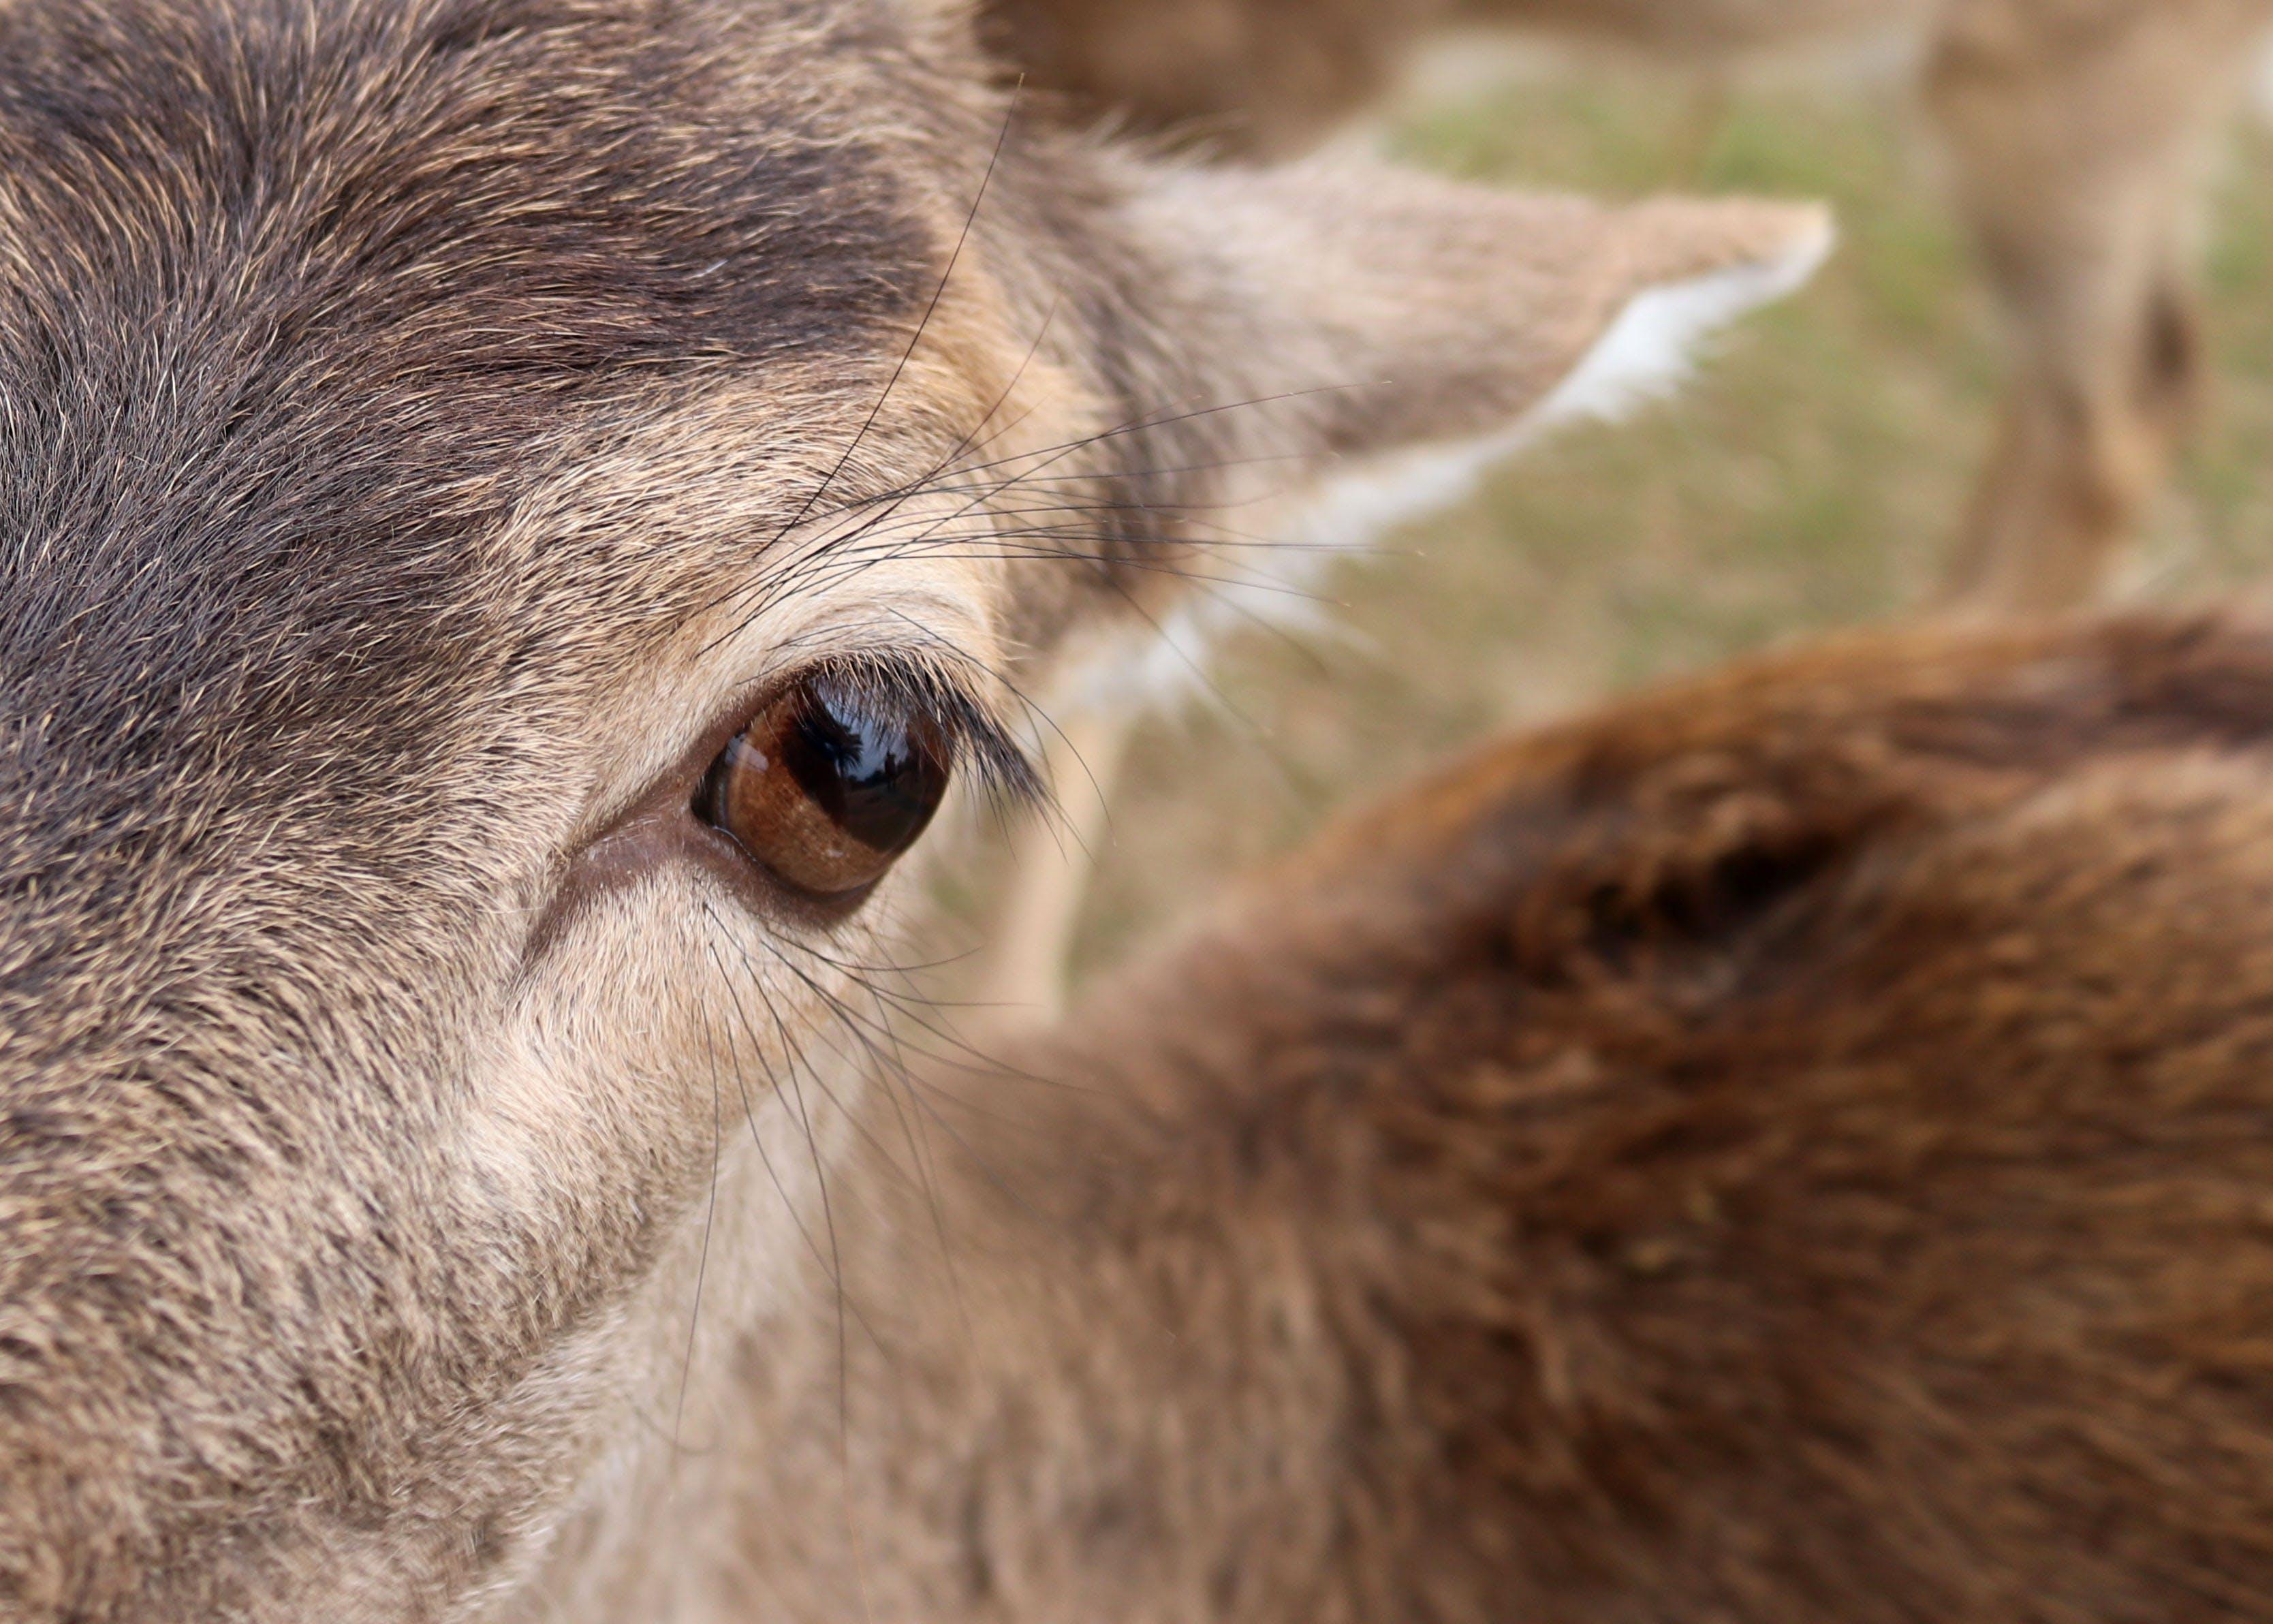 Free stock photo of animal, animals feeding, bison, bovine